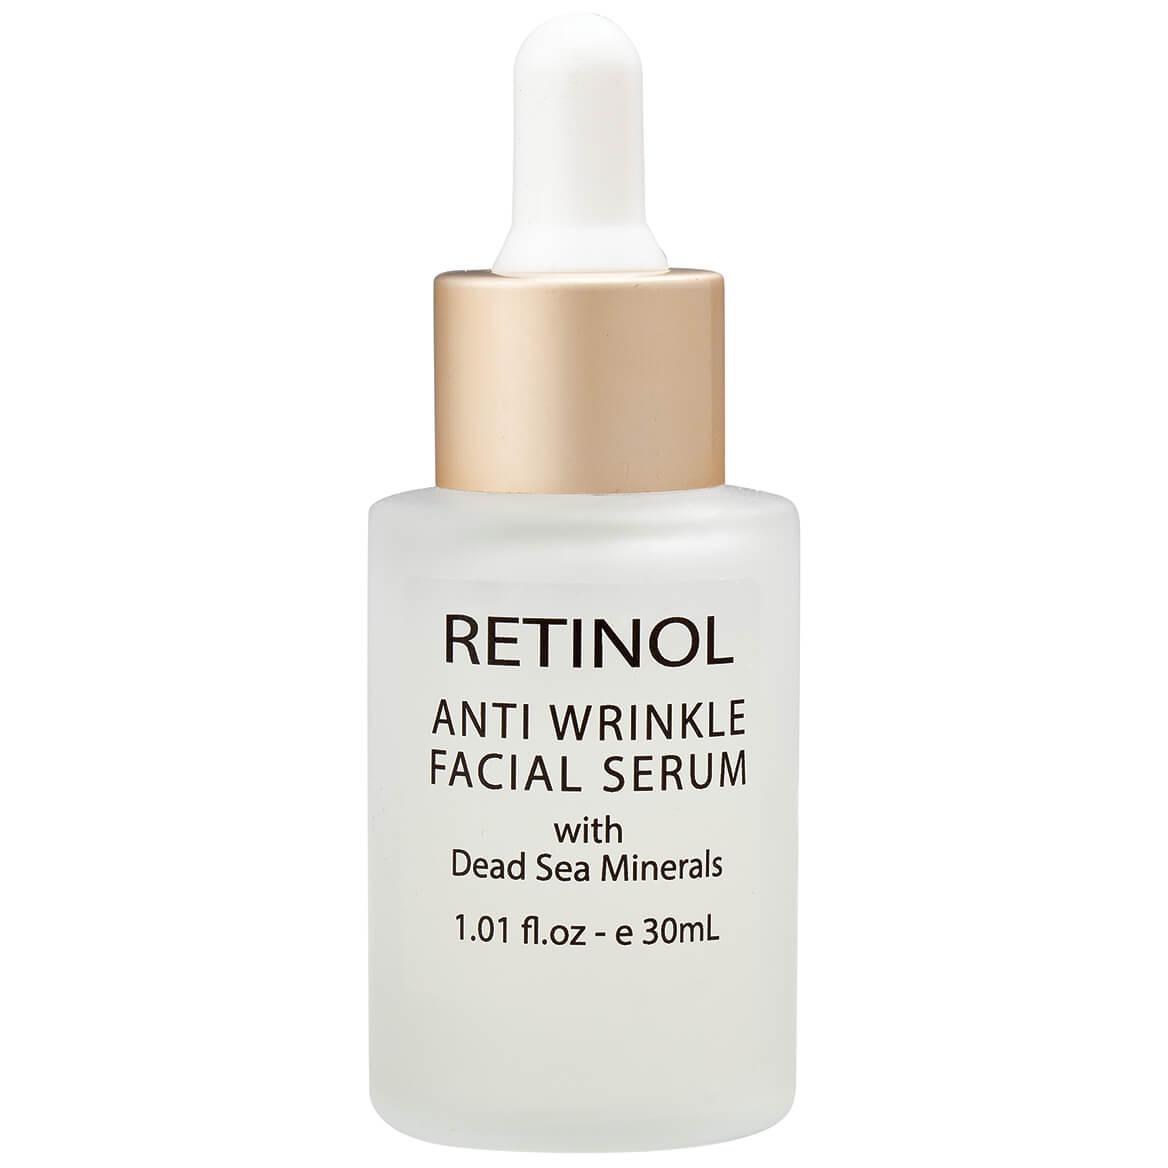 Dead Sea Collection Retinol Anti Wrinkle Facial Serum-371479